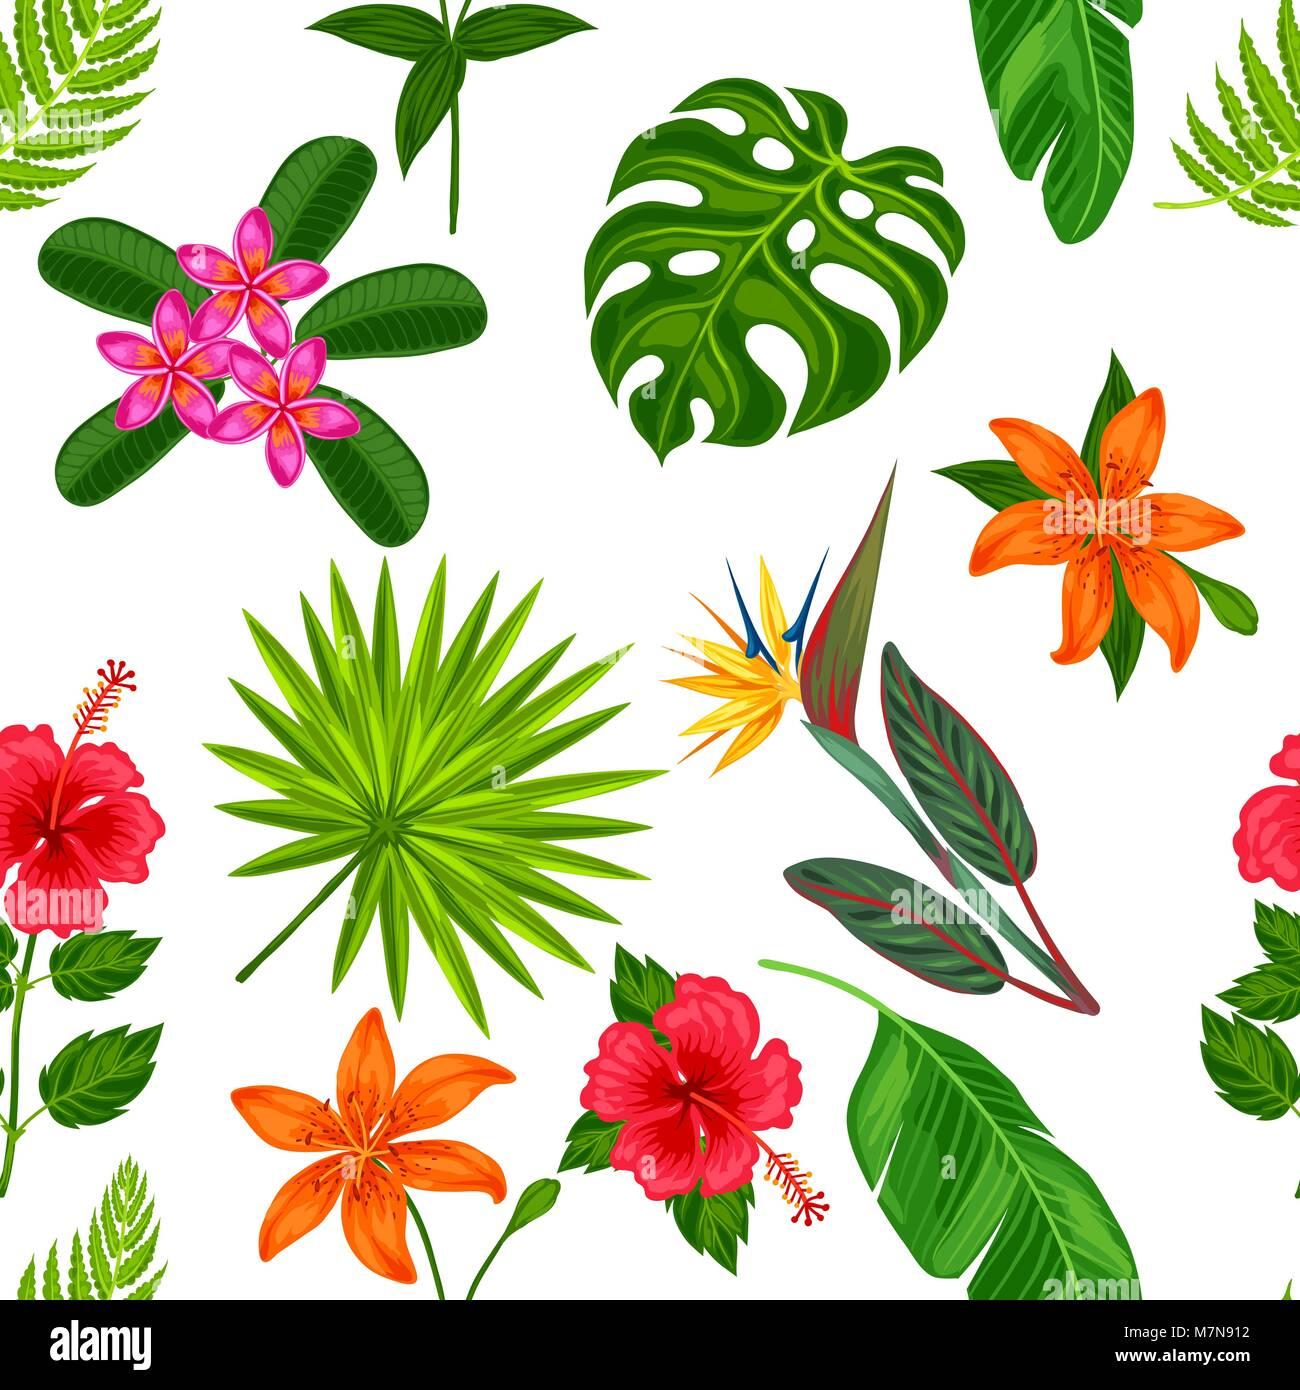 seamless wallpaper pattern fern stockfotos seamless wallpaper pattern fern bilder alamy. Black Bedroom Furniture Sets. Home Design Ideas